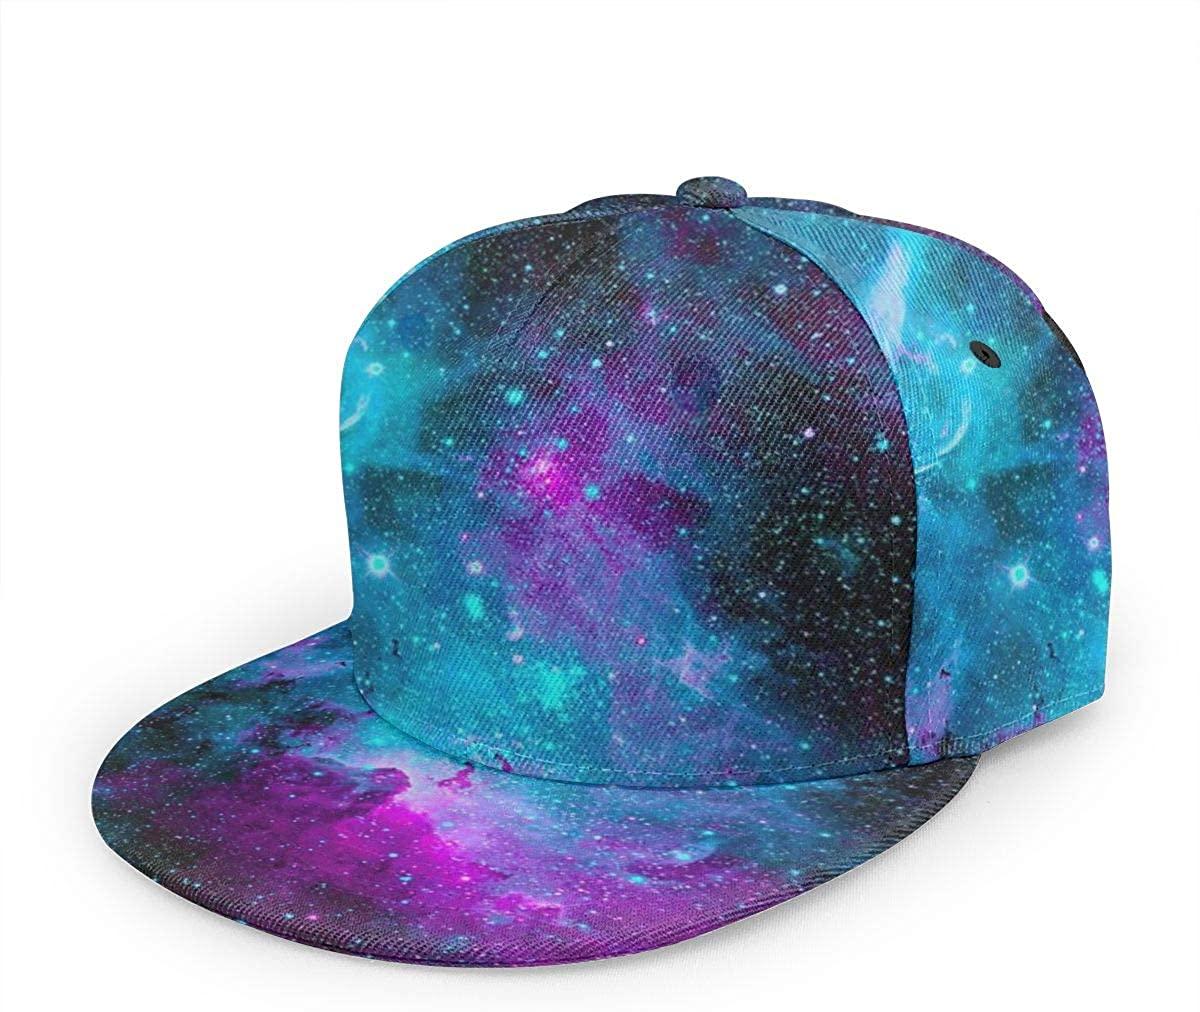 BWBFVPW Adjustable Snapback Hat Unisex Hip Hop Flat Brim Baseball Cap Galaxy